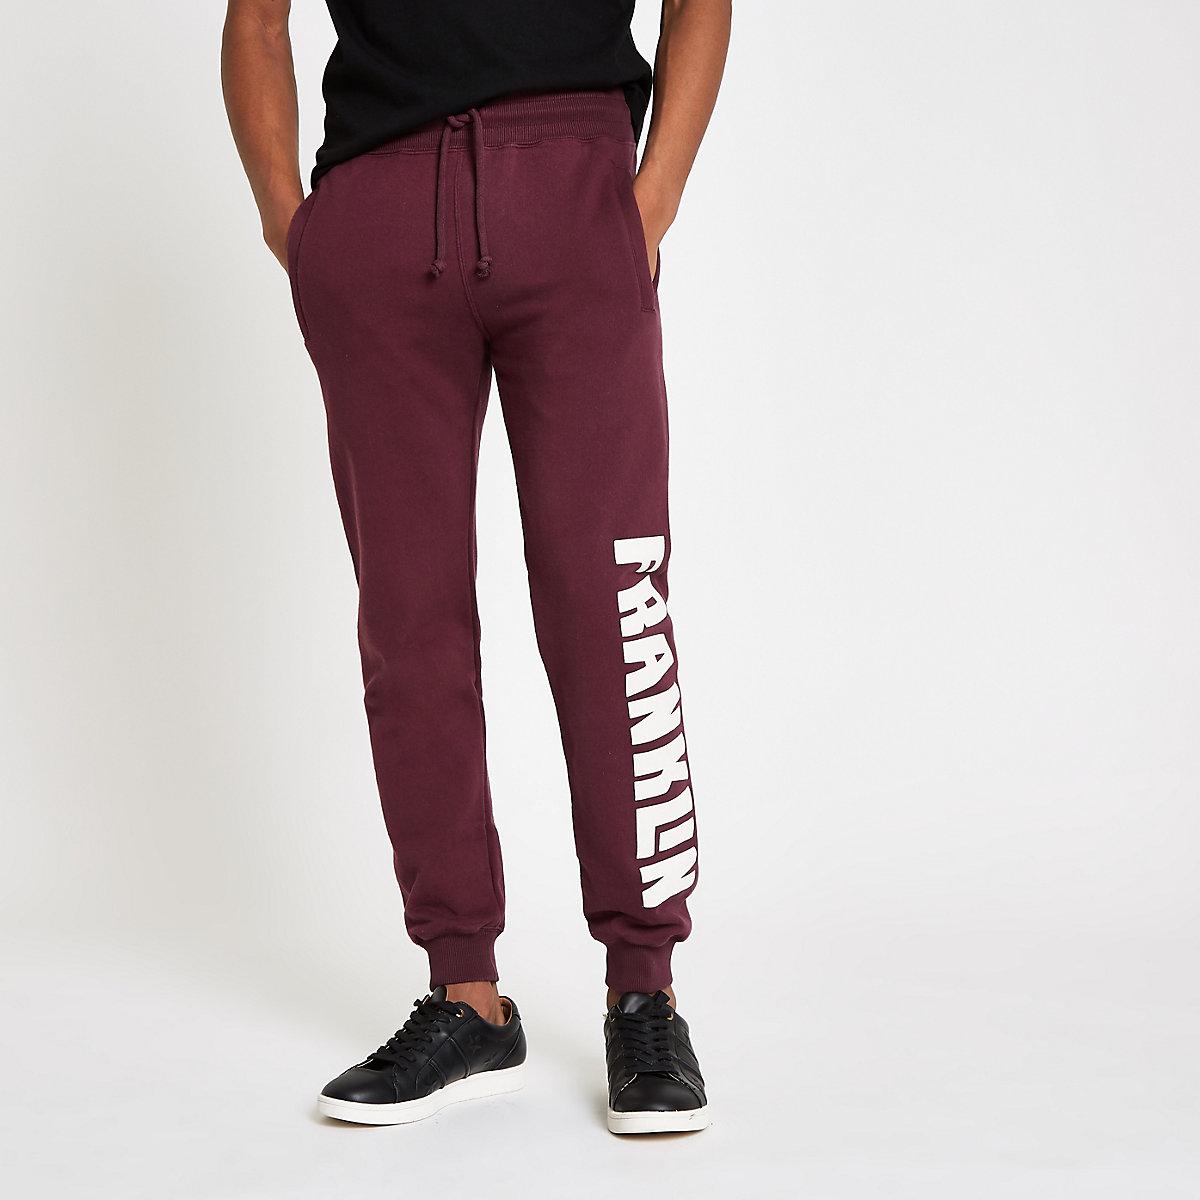 Franklin & Marshall burgundy fleece joggers